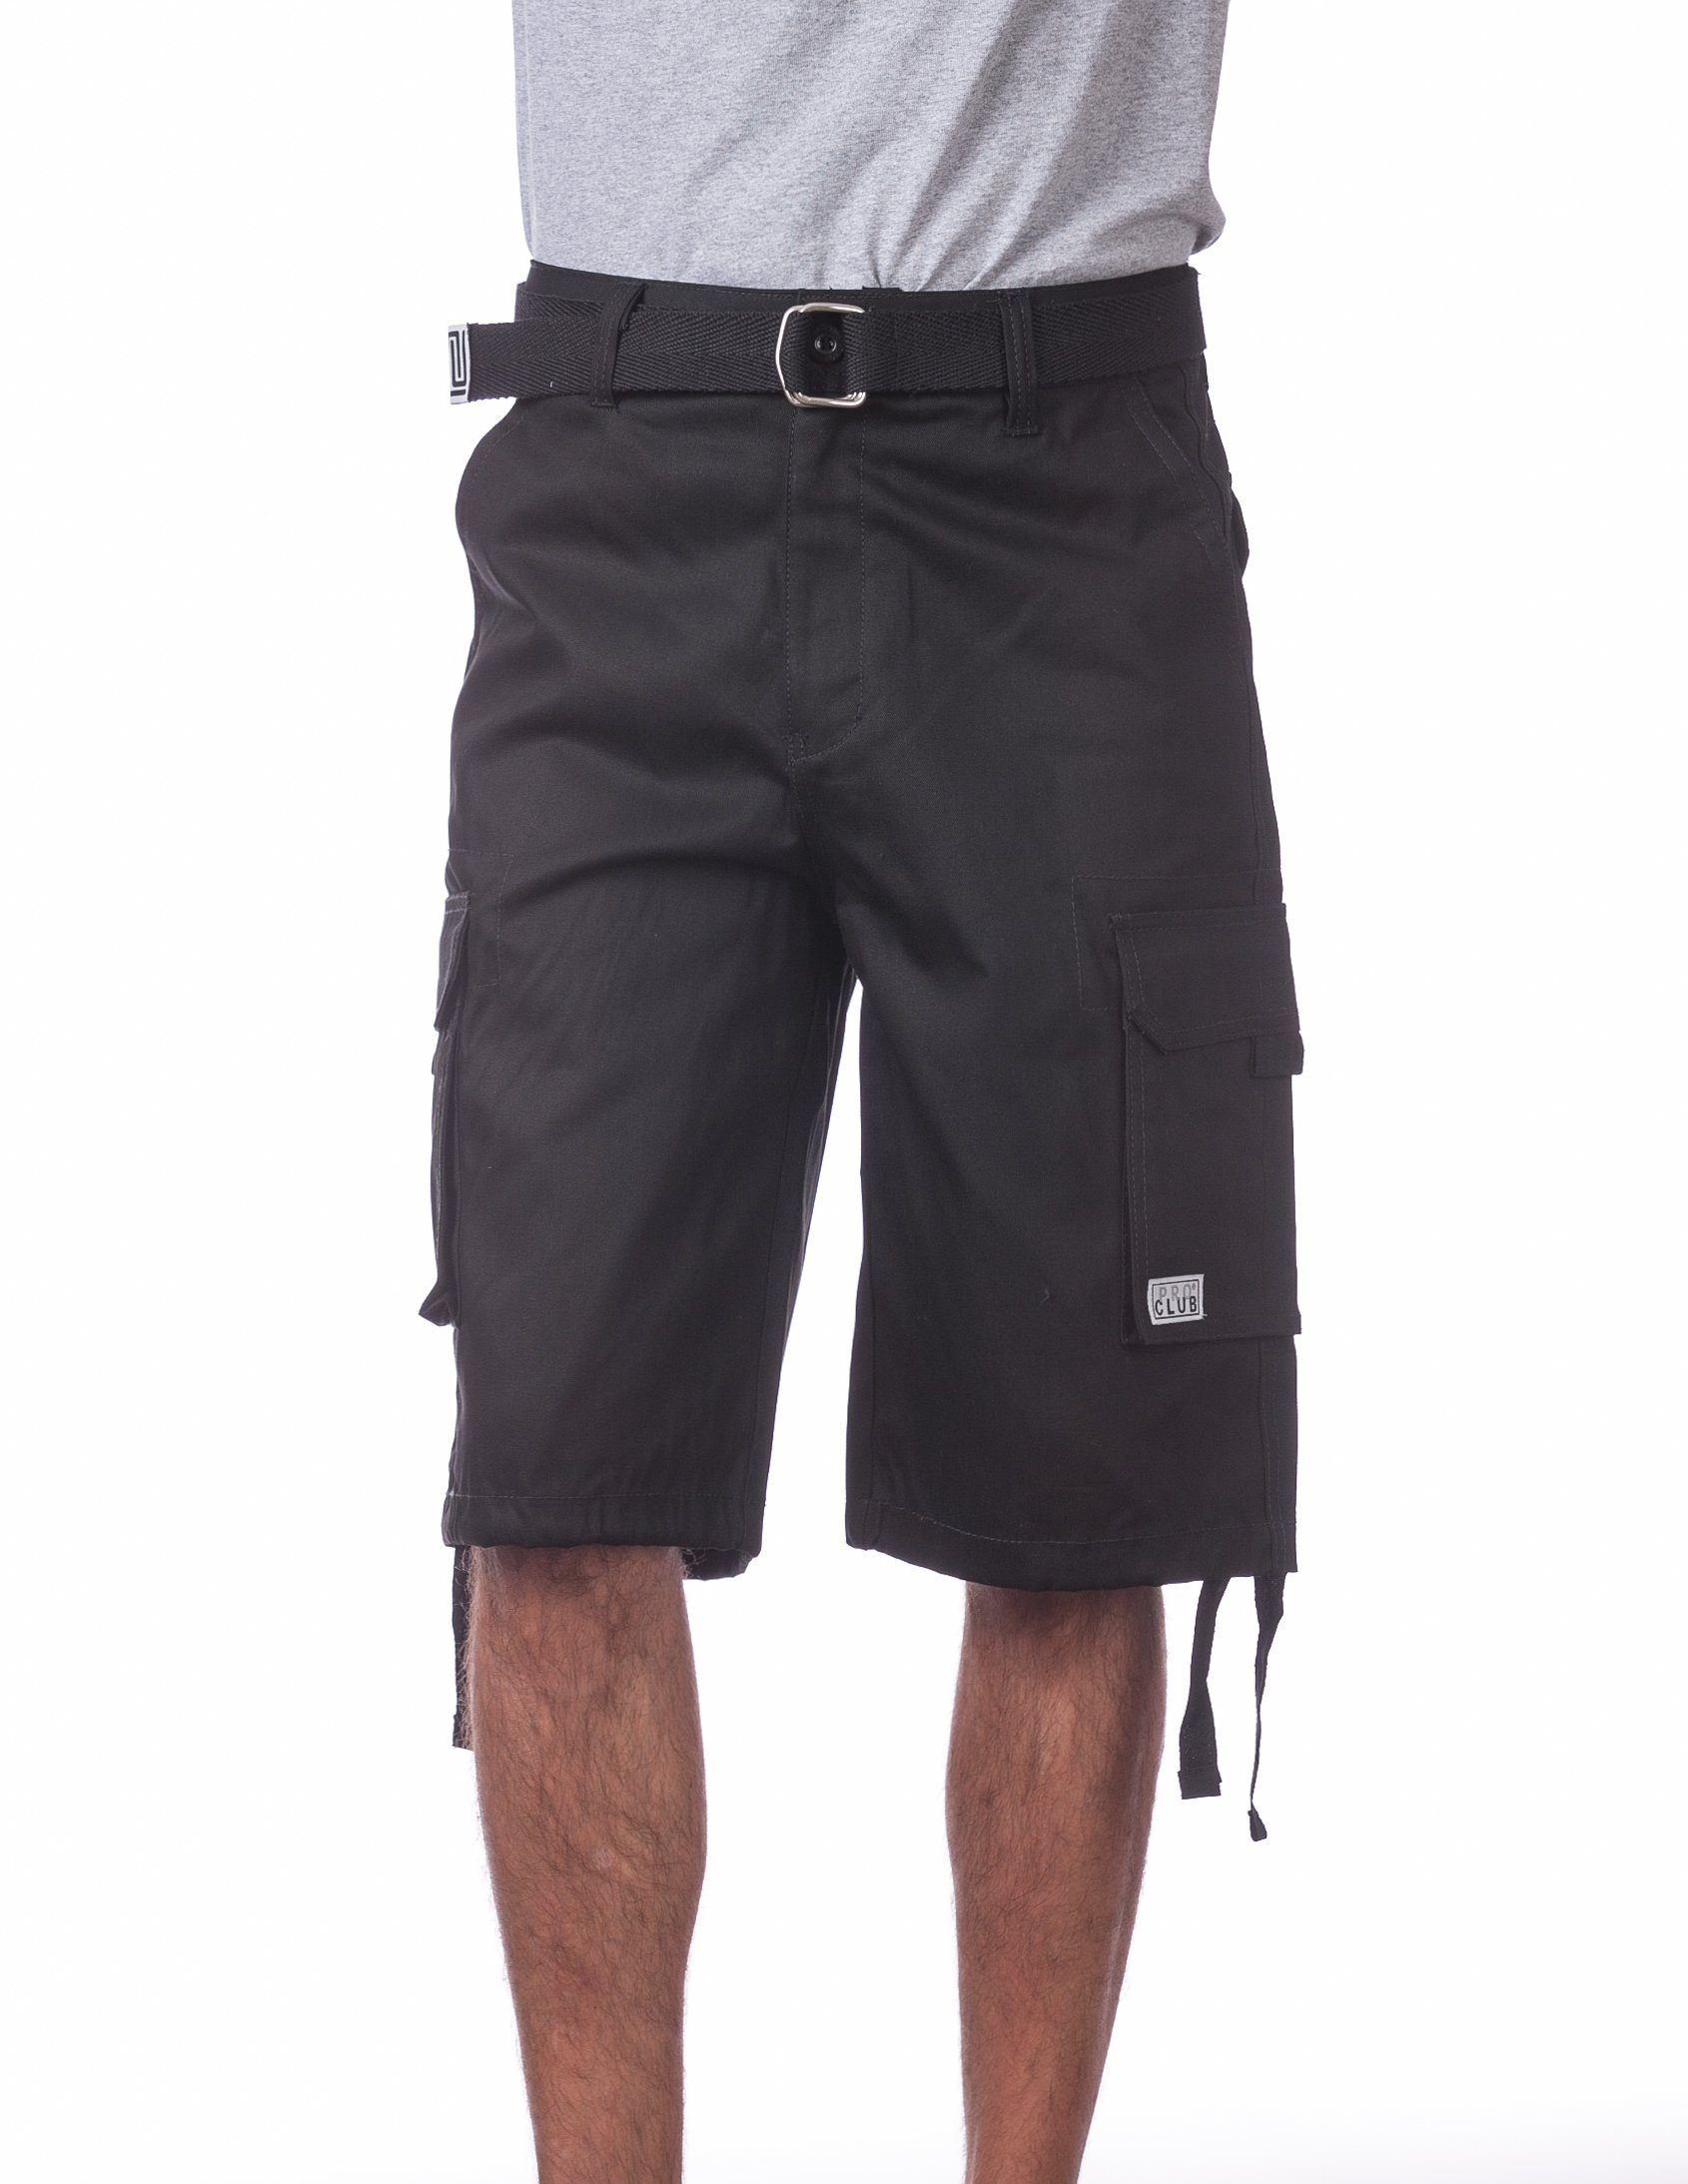 Pro Club Men's Cotton Twill Cargo Shorts with Belt, 42'', Black